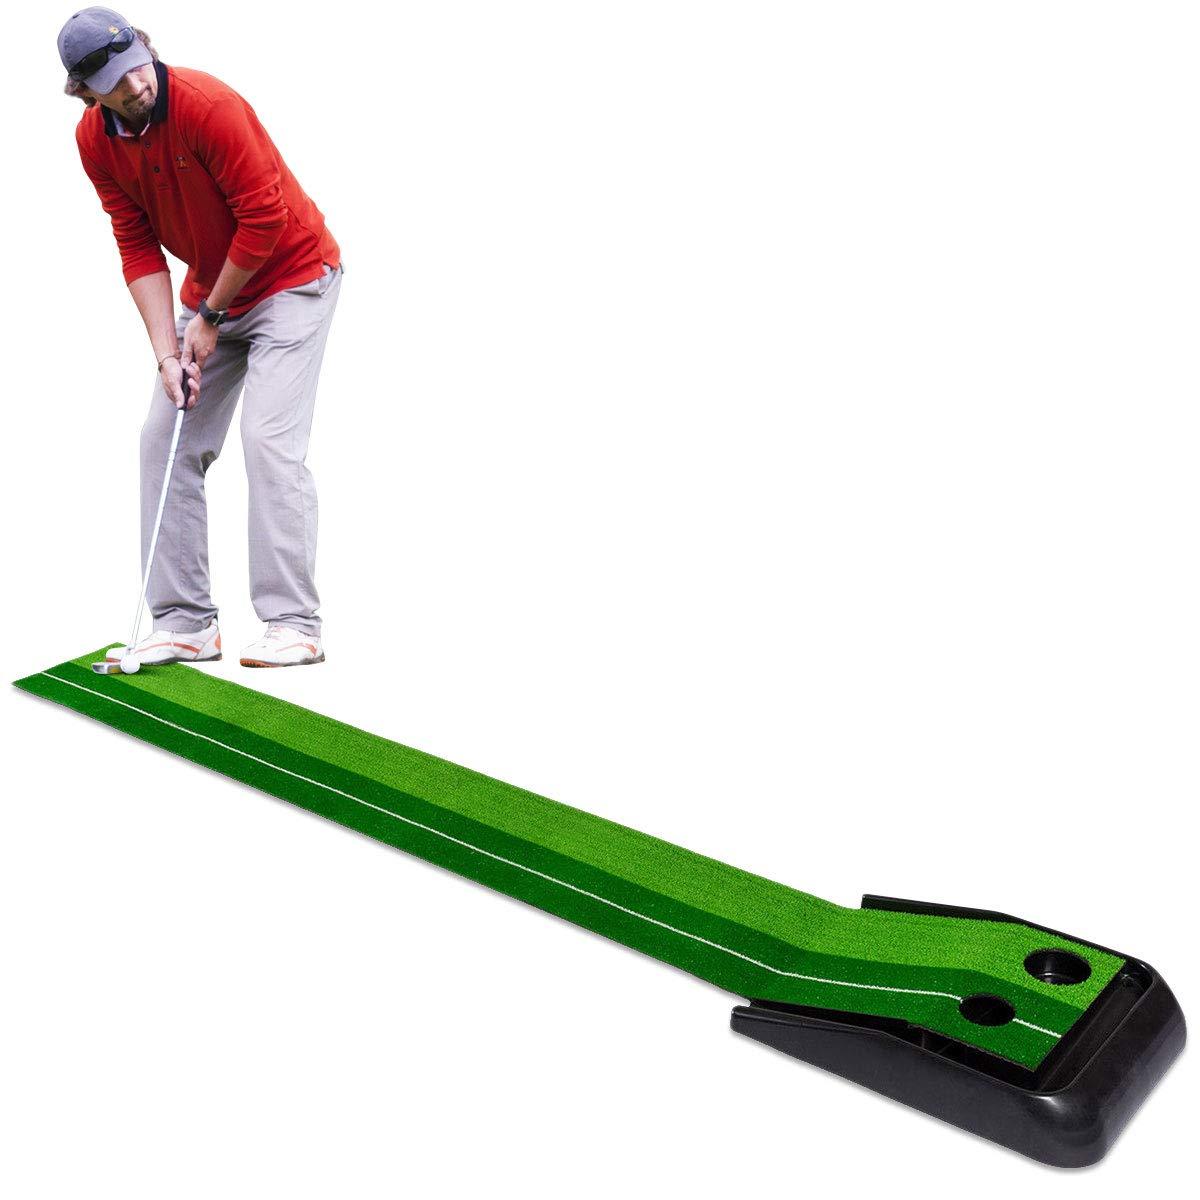 Tangkula 2.4m Putting Mat Indoor Outdoor Golf Practise Training Mat Green Grass Turf Ball Return   B01MS3WS83